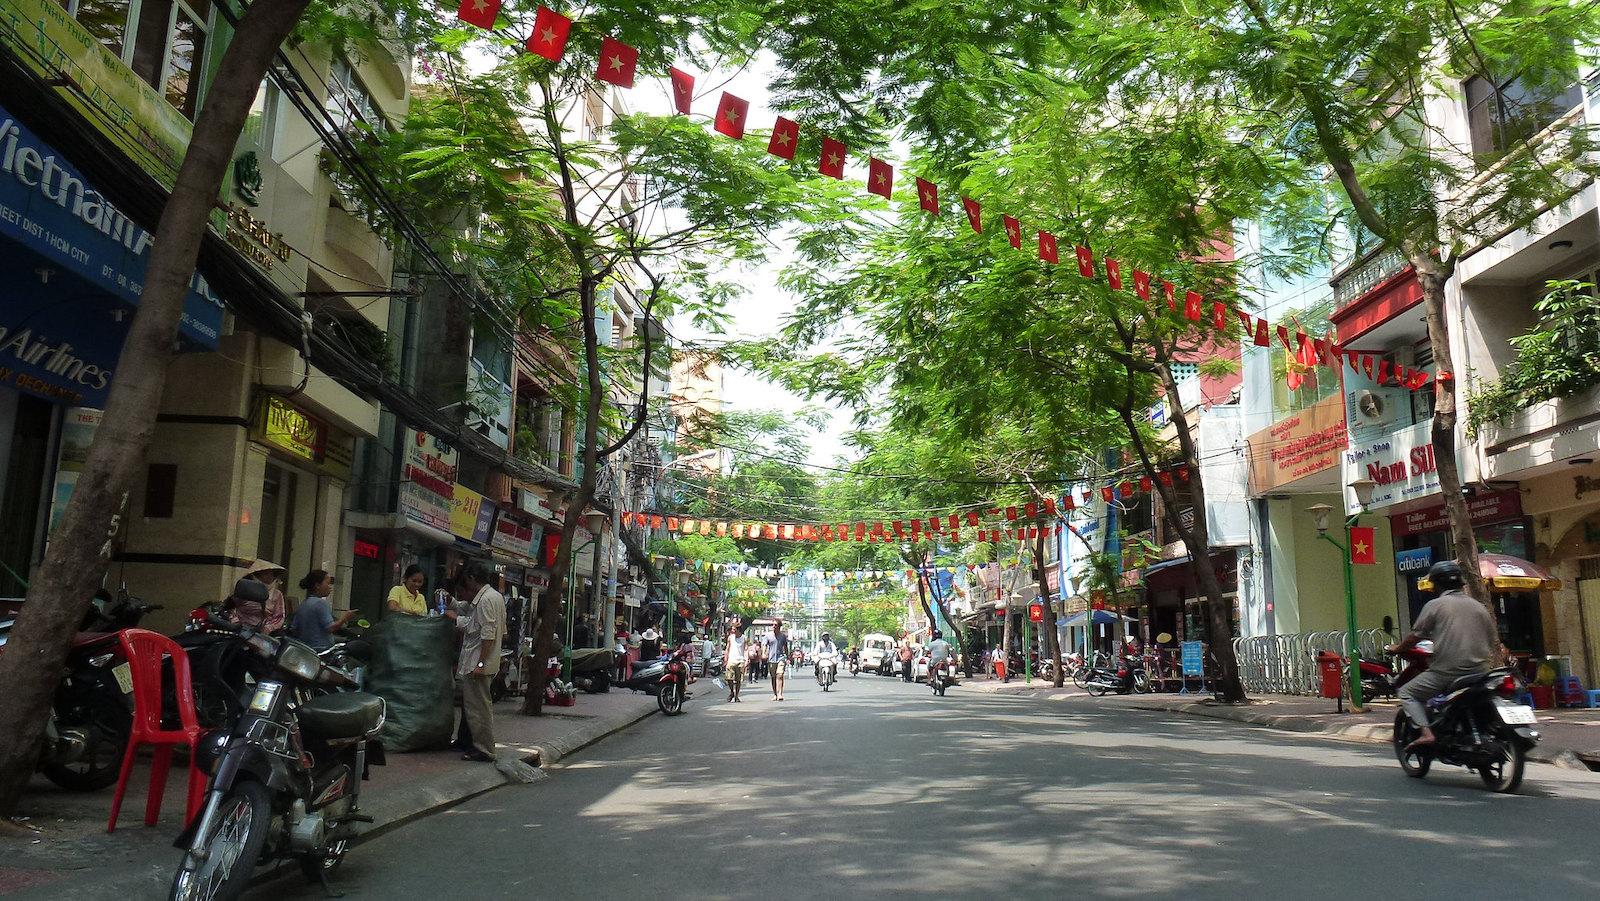 Image of a street in Saigon, Vietnam